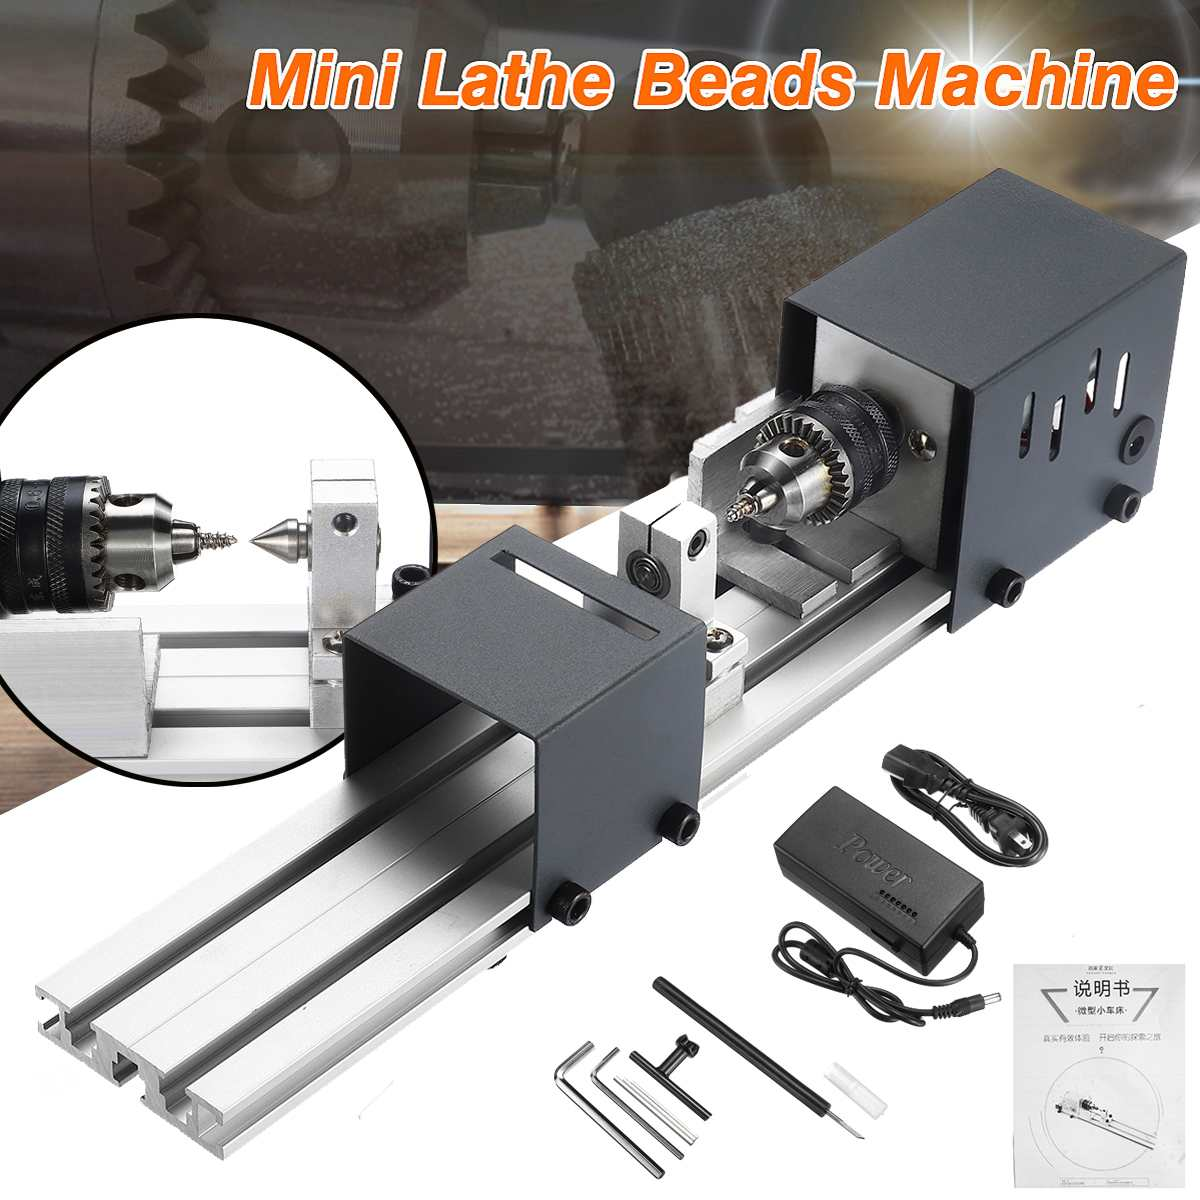 80W DC 24V Mini Drehmaschine Perlen Maschine Holzbearbeitung DIY Drehmaschine Standard Set Polieren Schneiden Bohrer Dreh Werkzeug